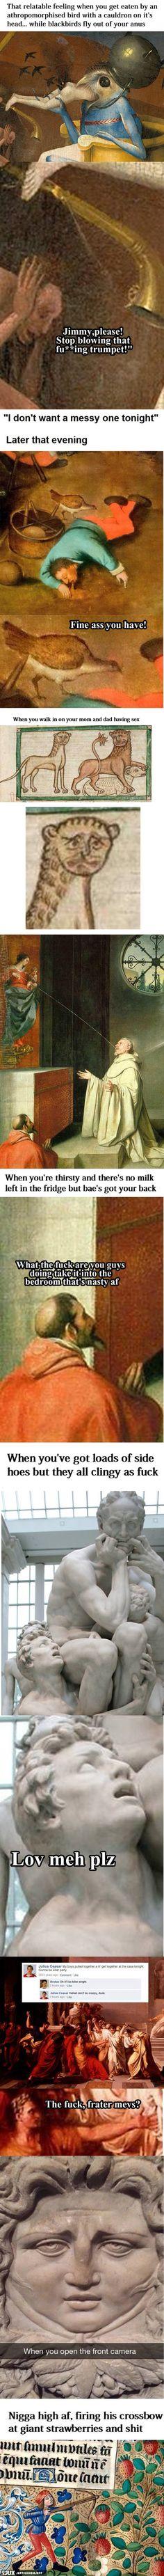 - Genius Meme - Genius Meme The post appeared first on Gag Dad. The post appeared first on Gag Dad. Funny Art, The Funny, Best Memes, Funny Memes, Hilarious, Medieval Reactions, Renaissance Memes, Art History Memes, Classical Art Memes